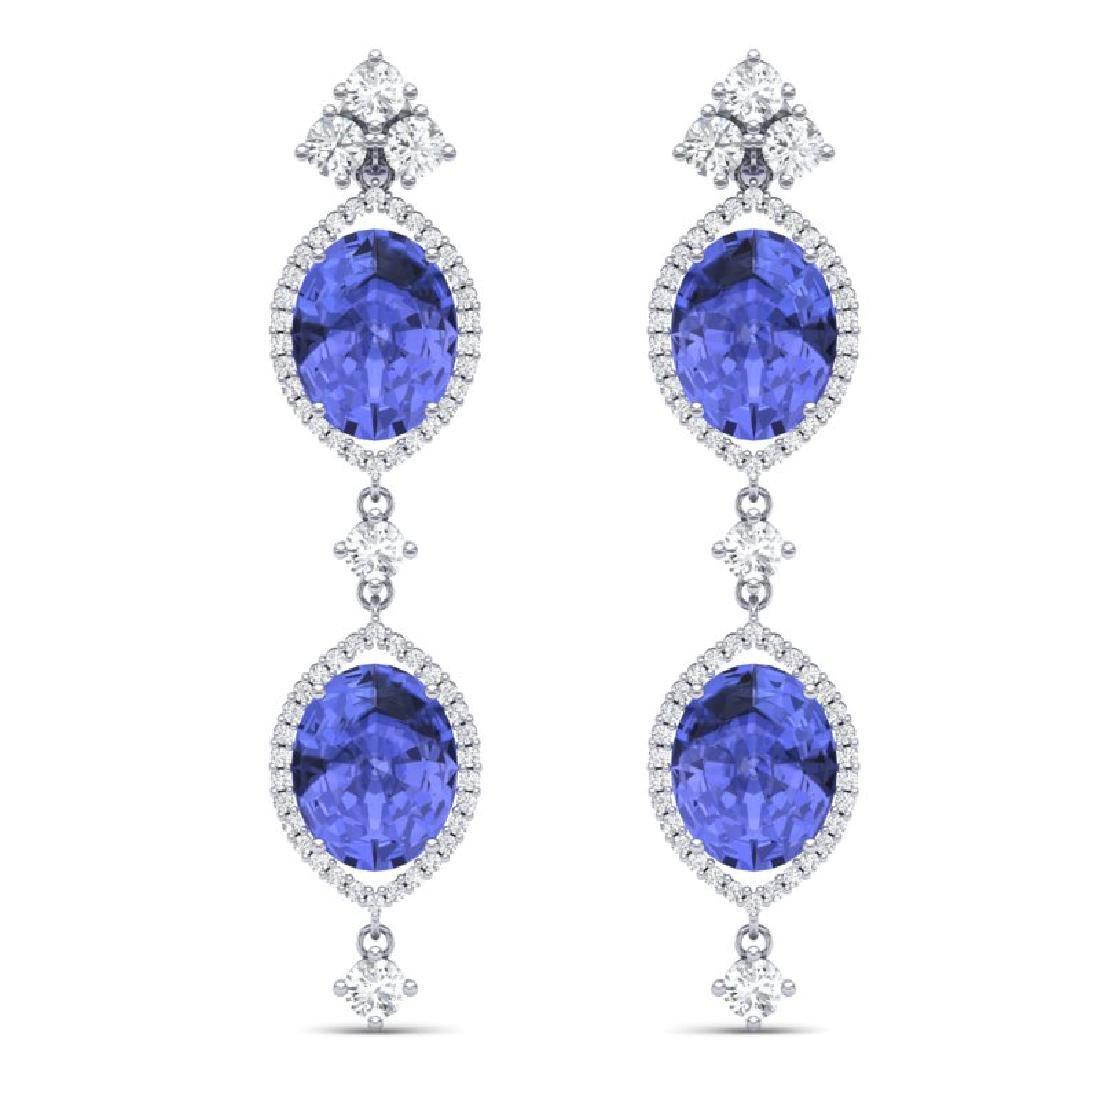 16.21 CTW Royalty Tanzanite & VS Diamond Earrings 18K